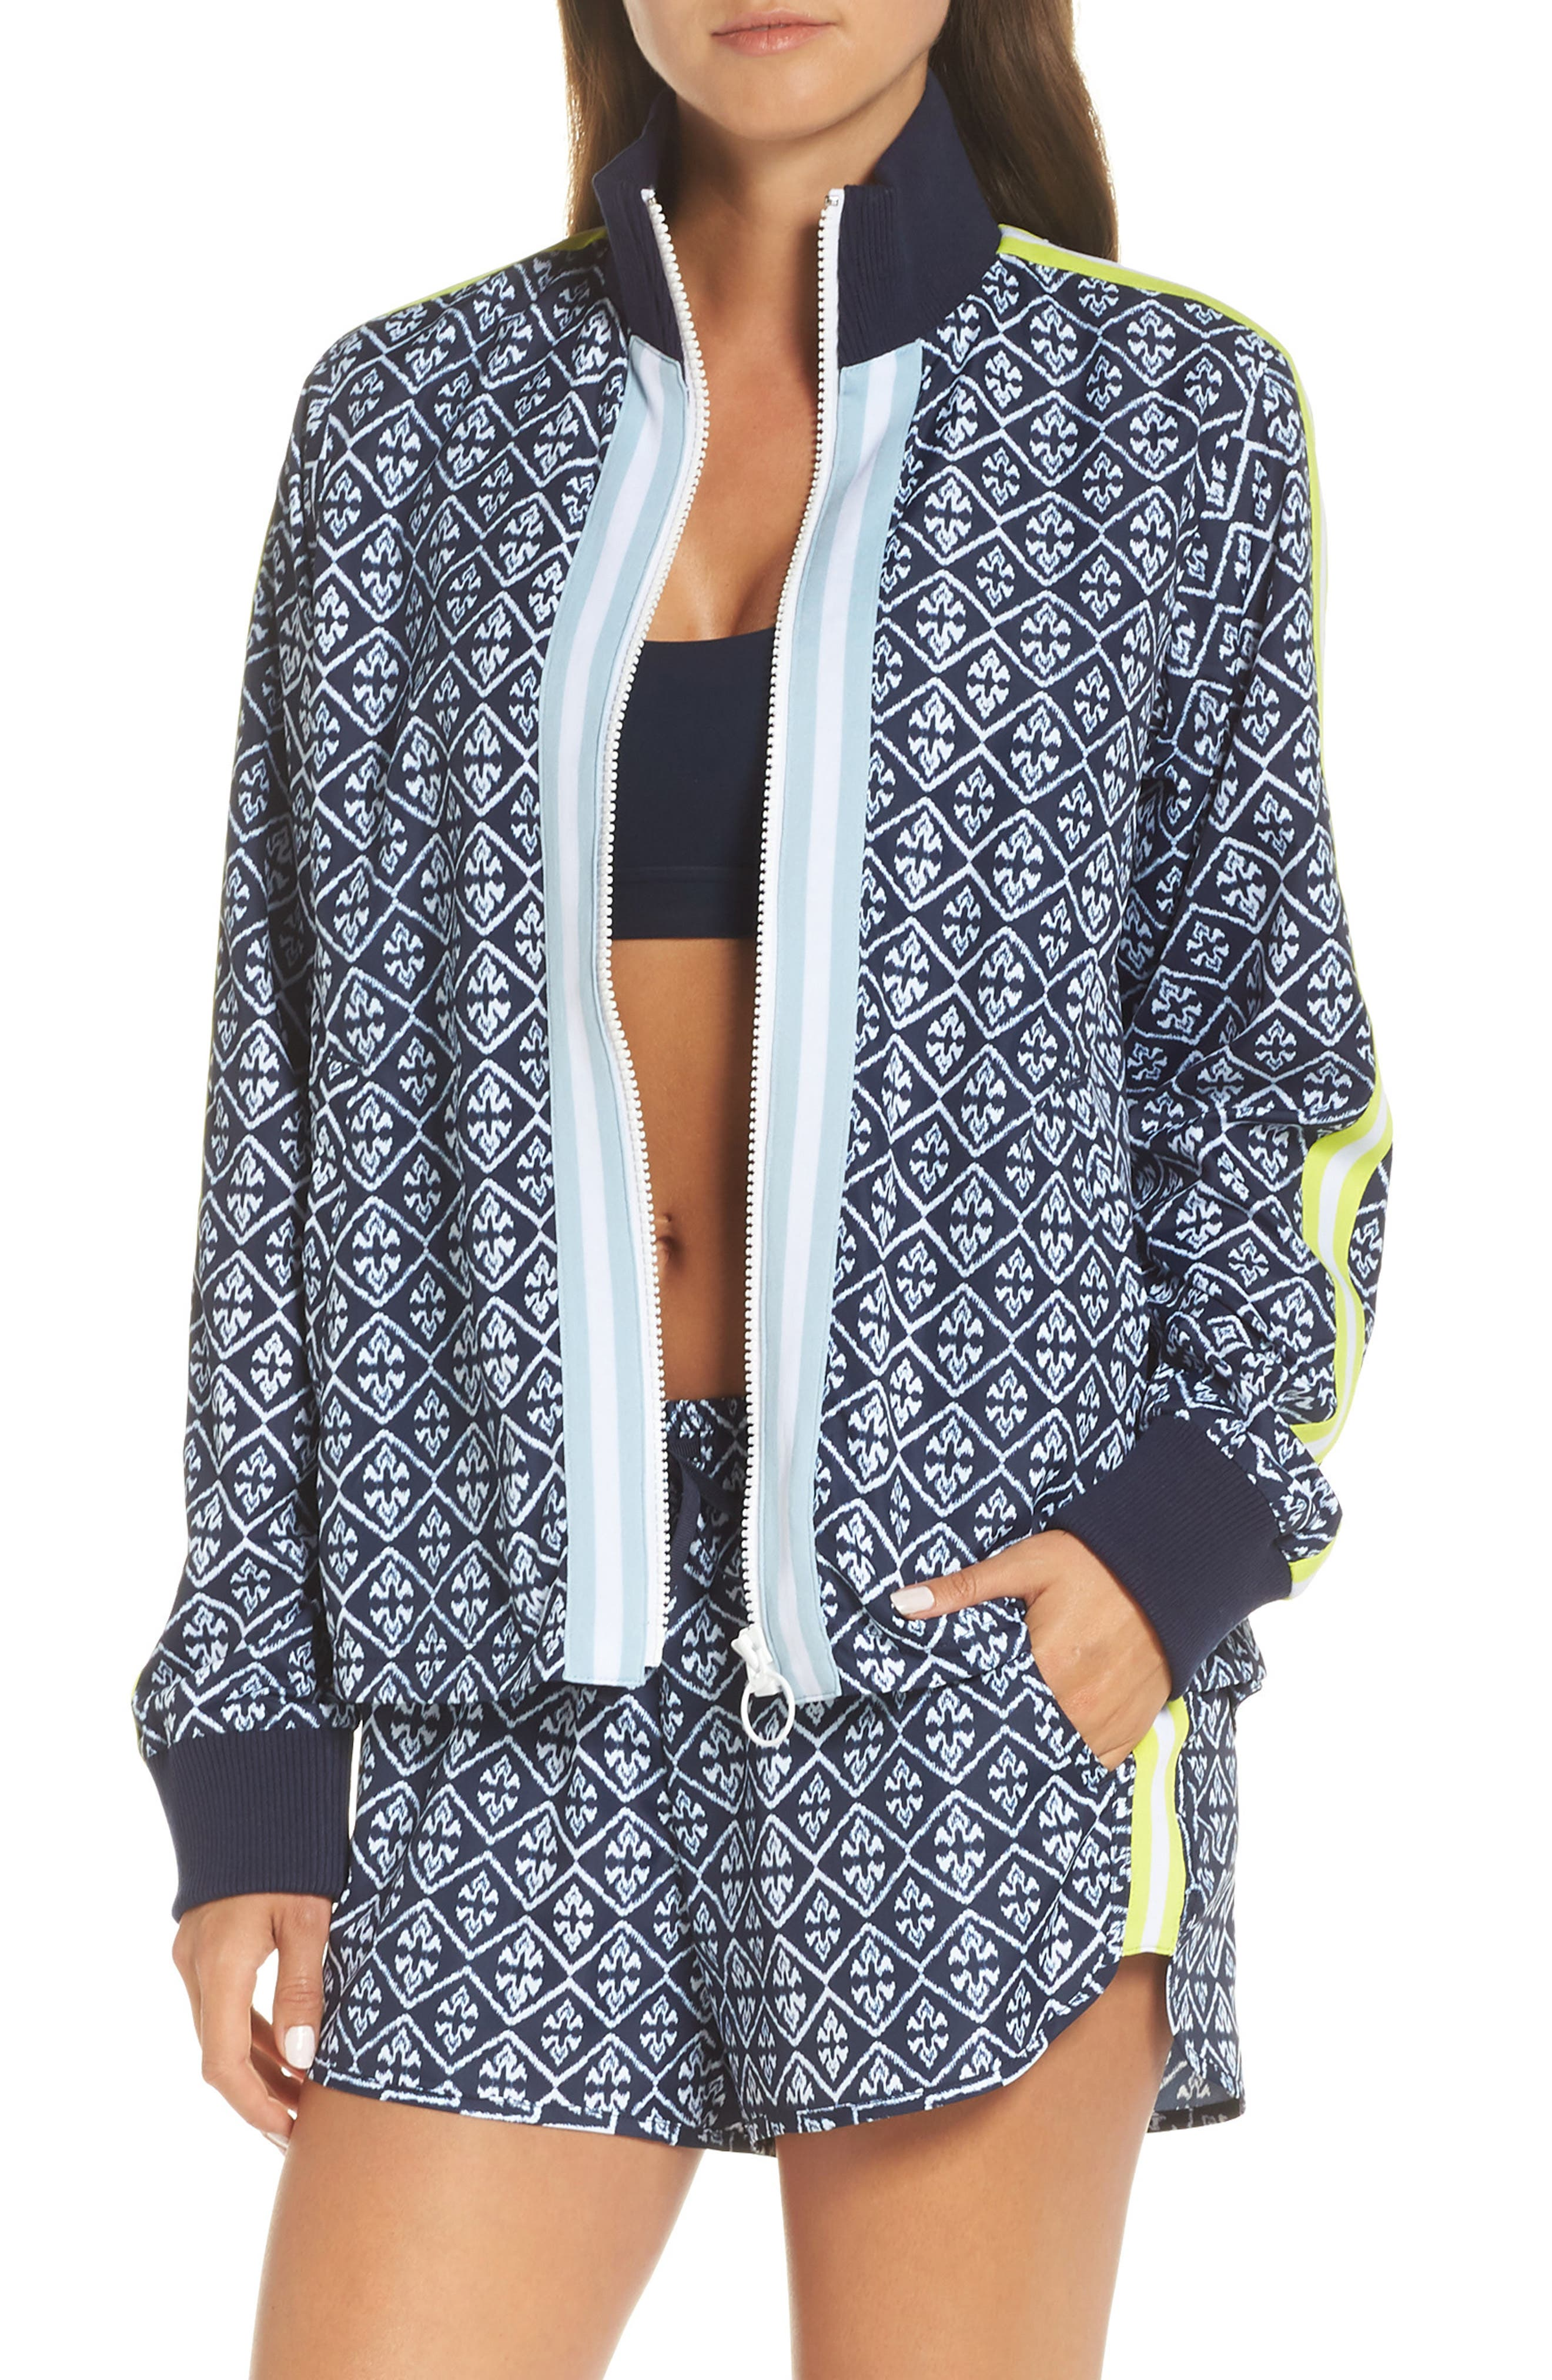 Ikat Neon Running Shorts,                             Alternate thumbnail 8, color,                             INDIGO/ WHITE